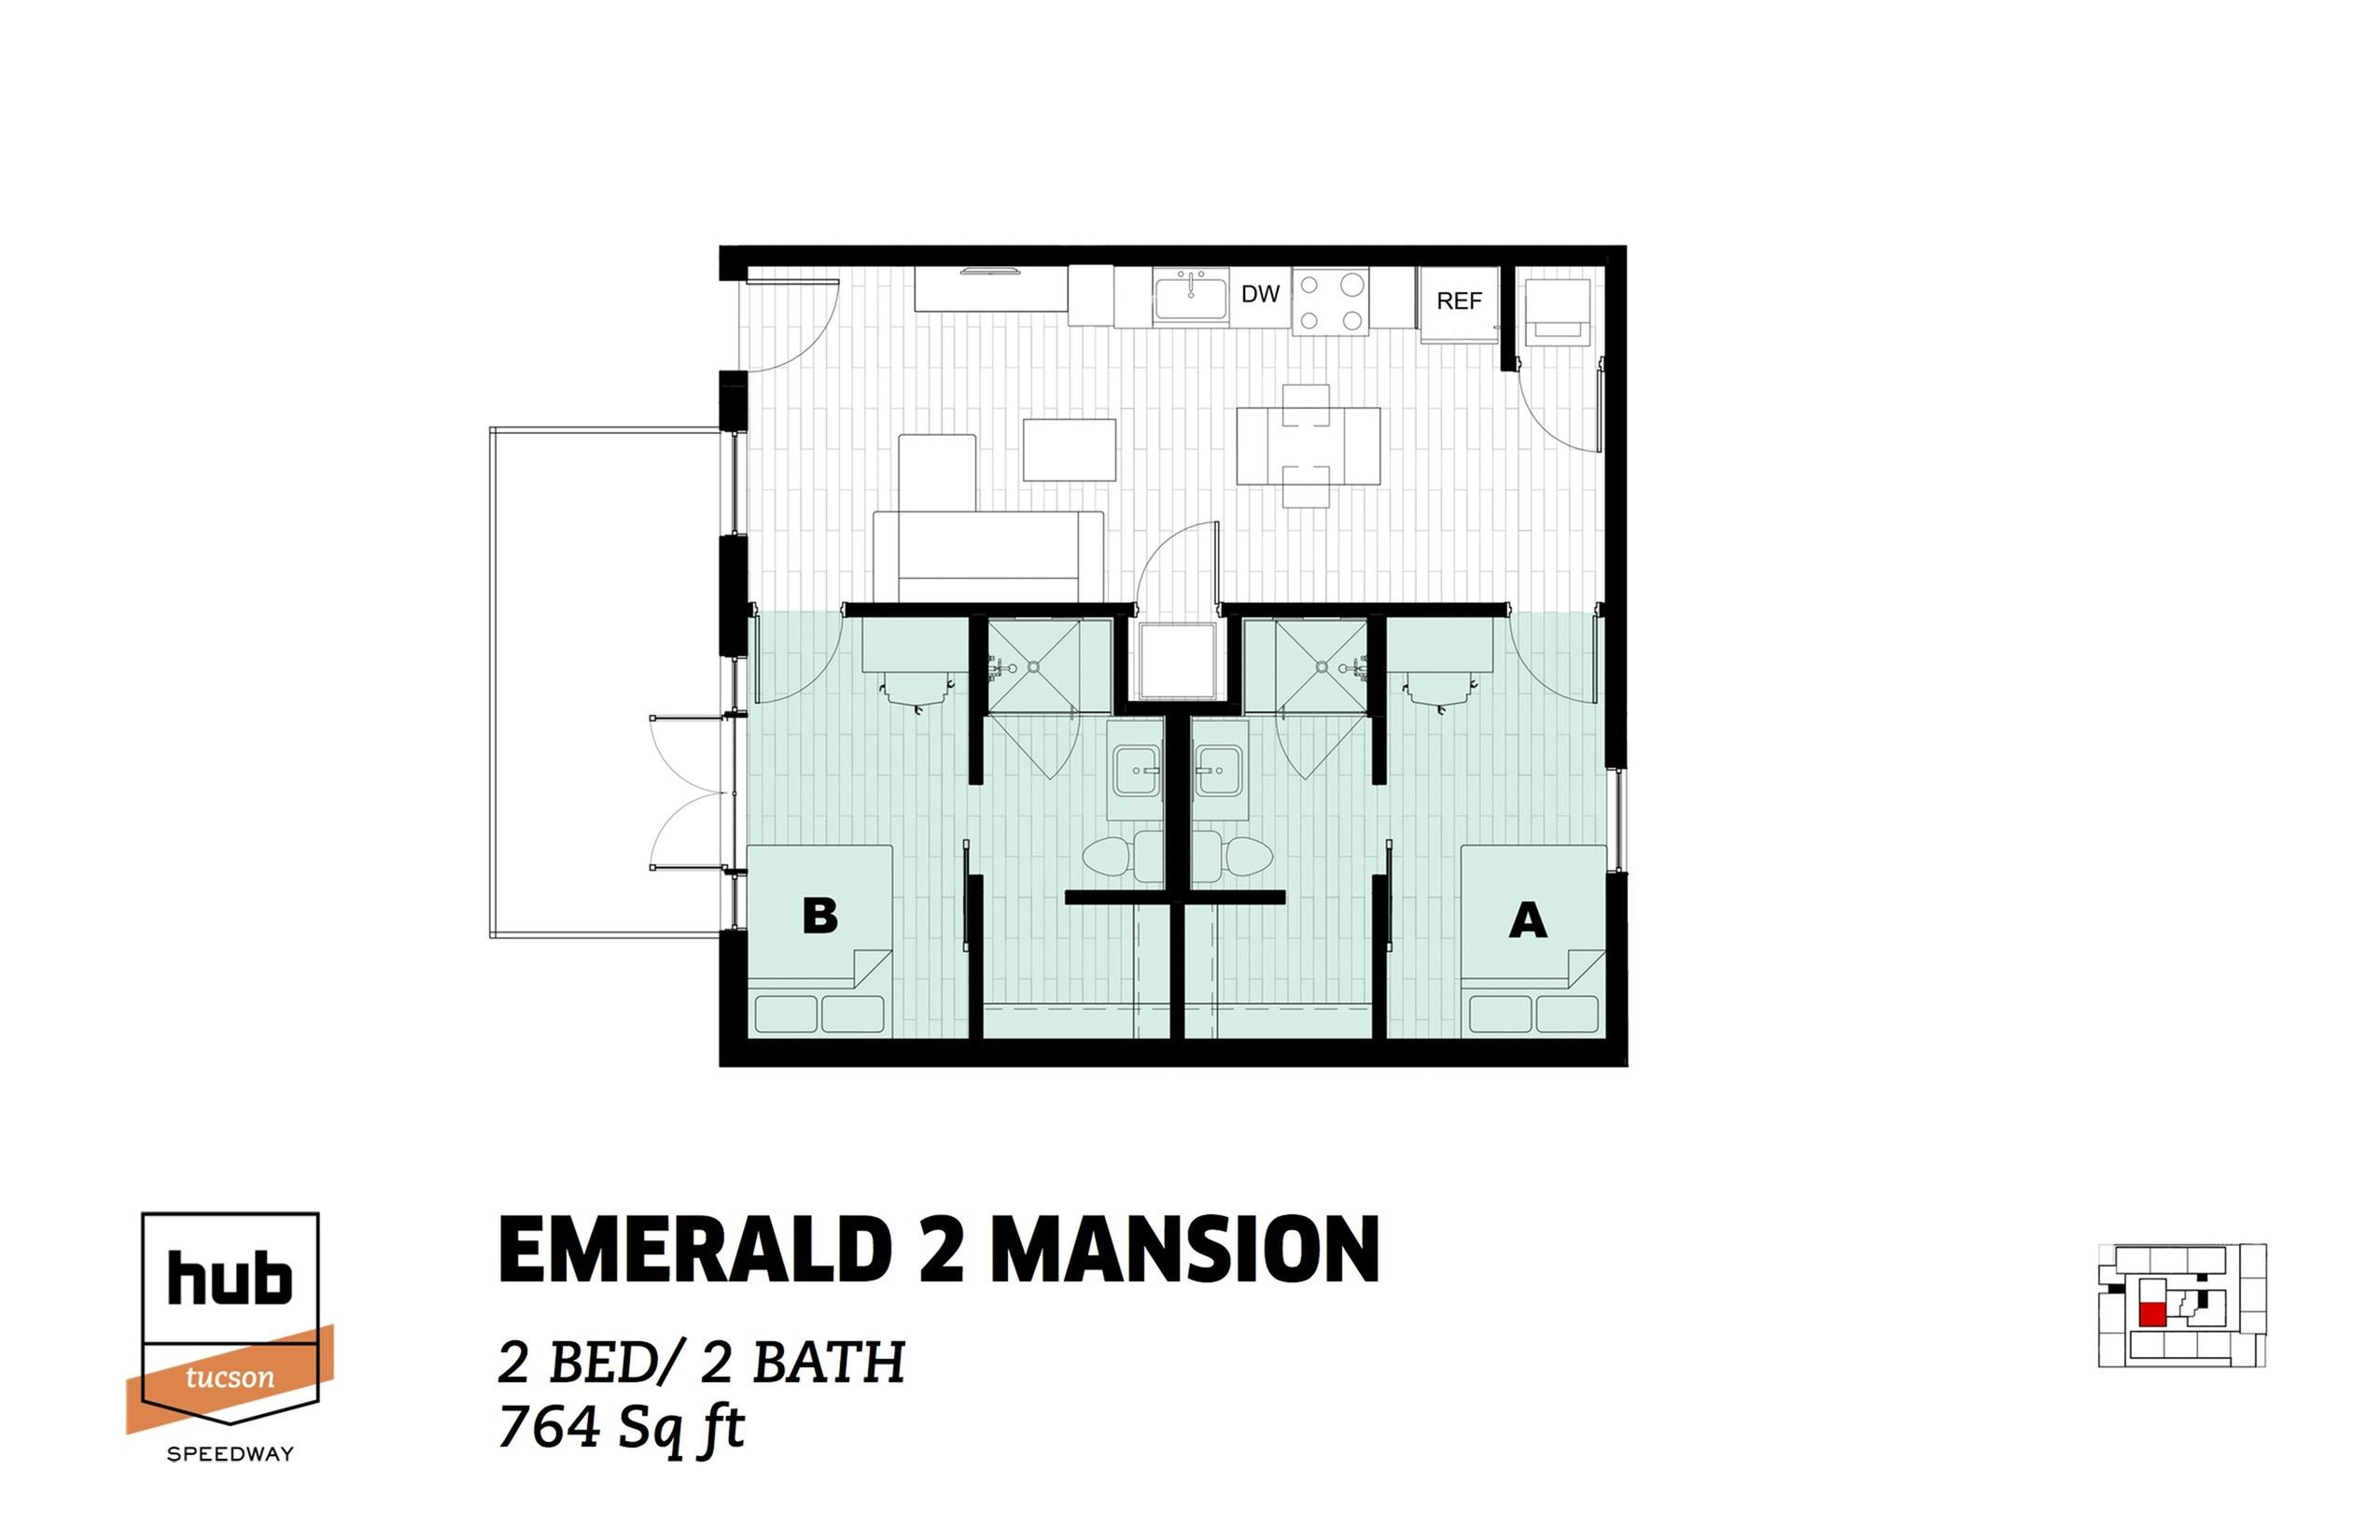 Emerald 2 Mansion